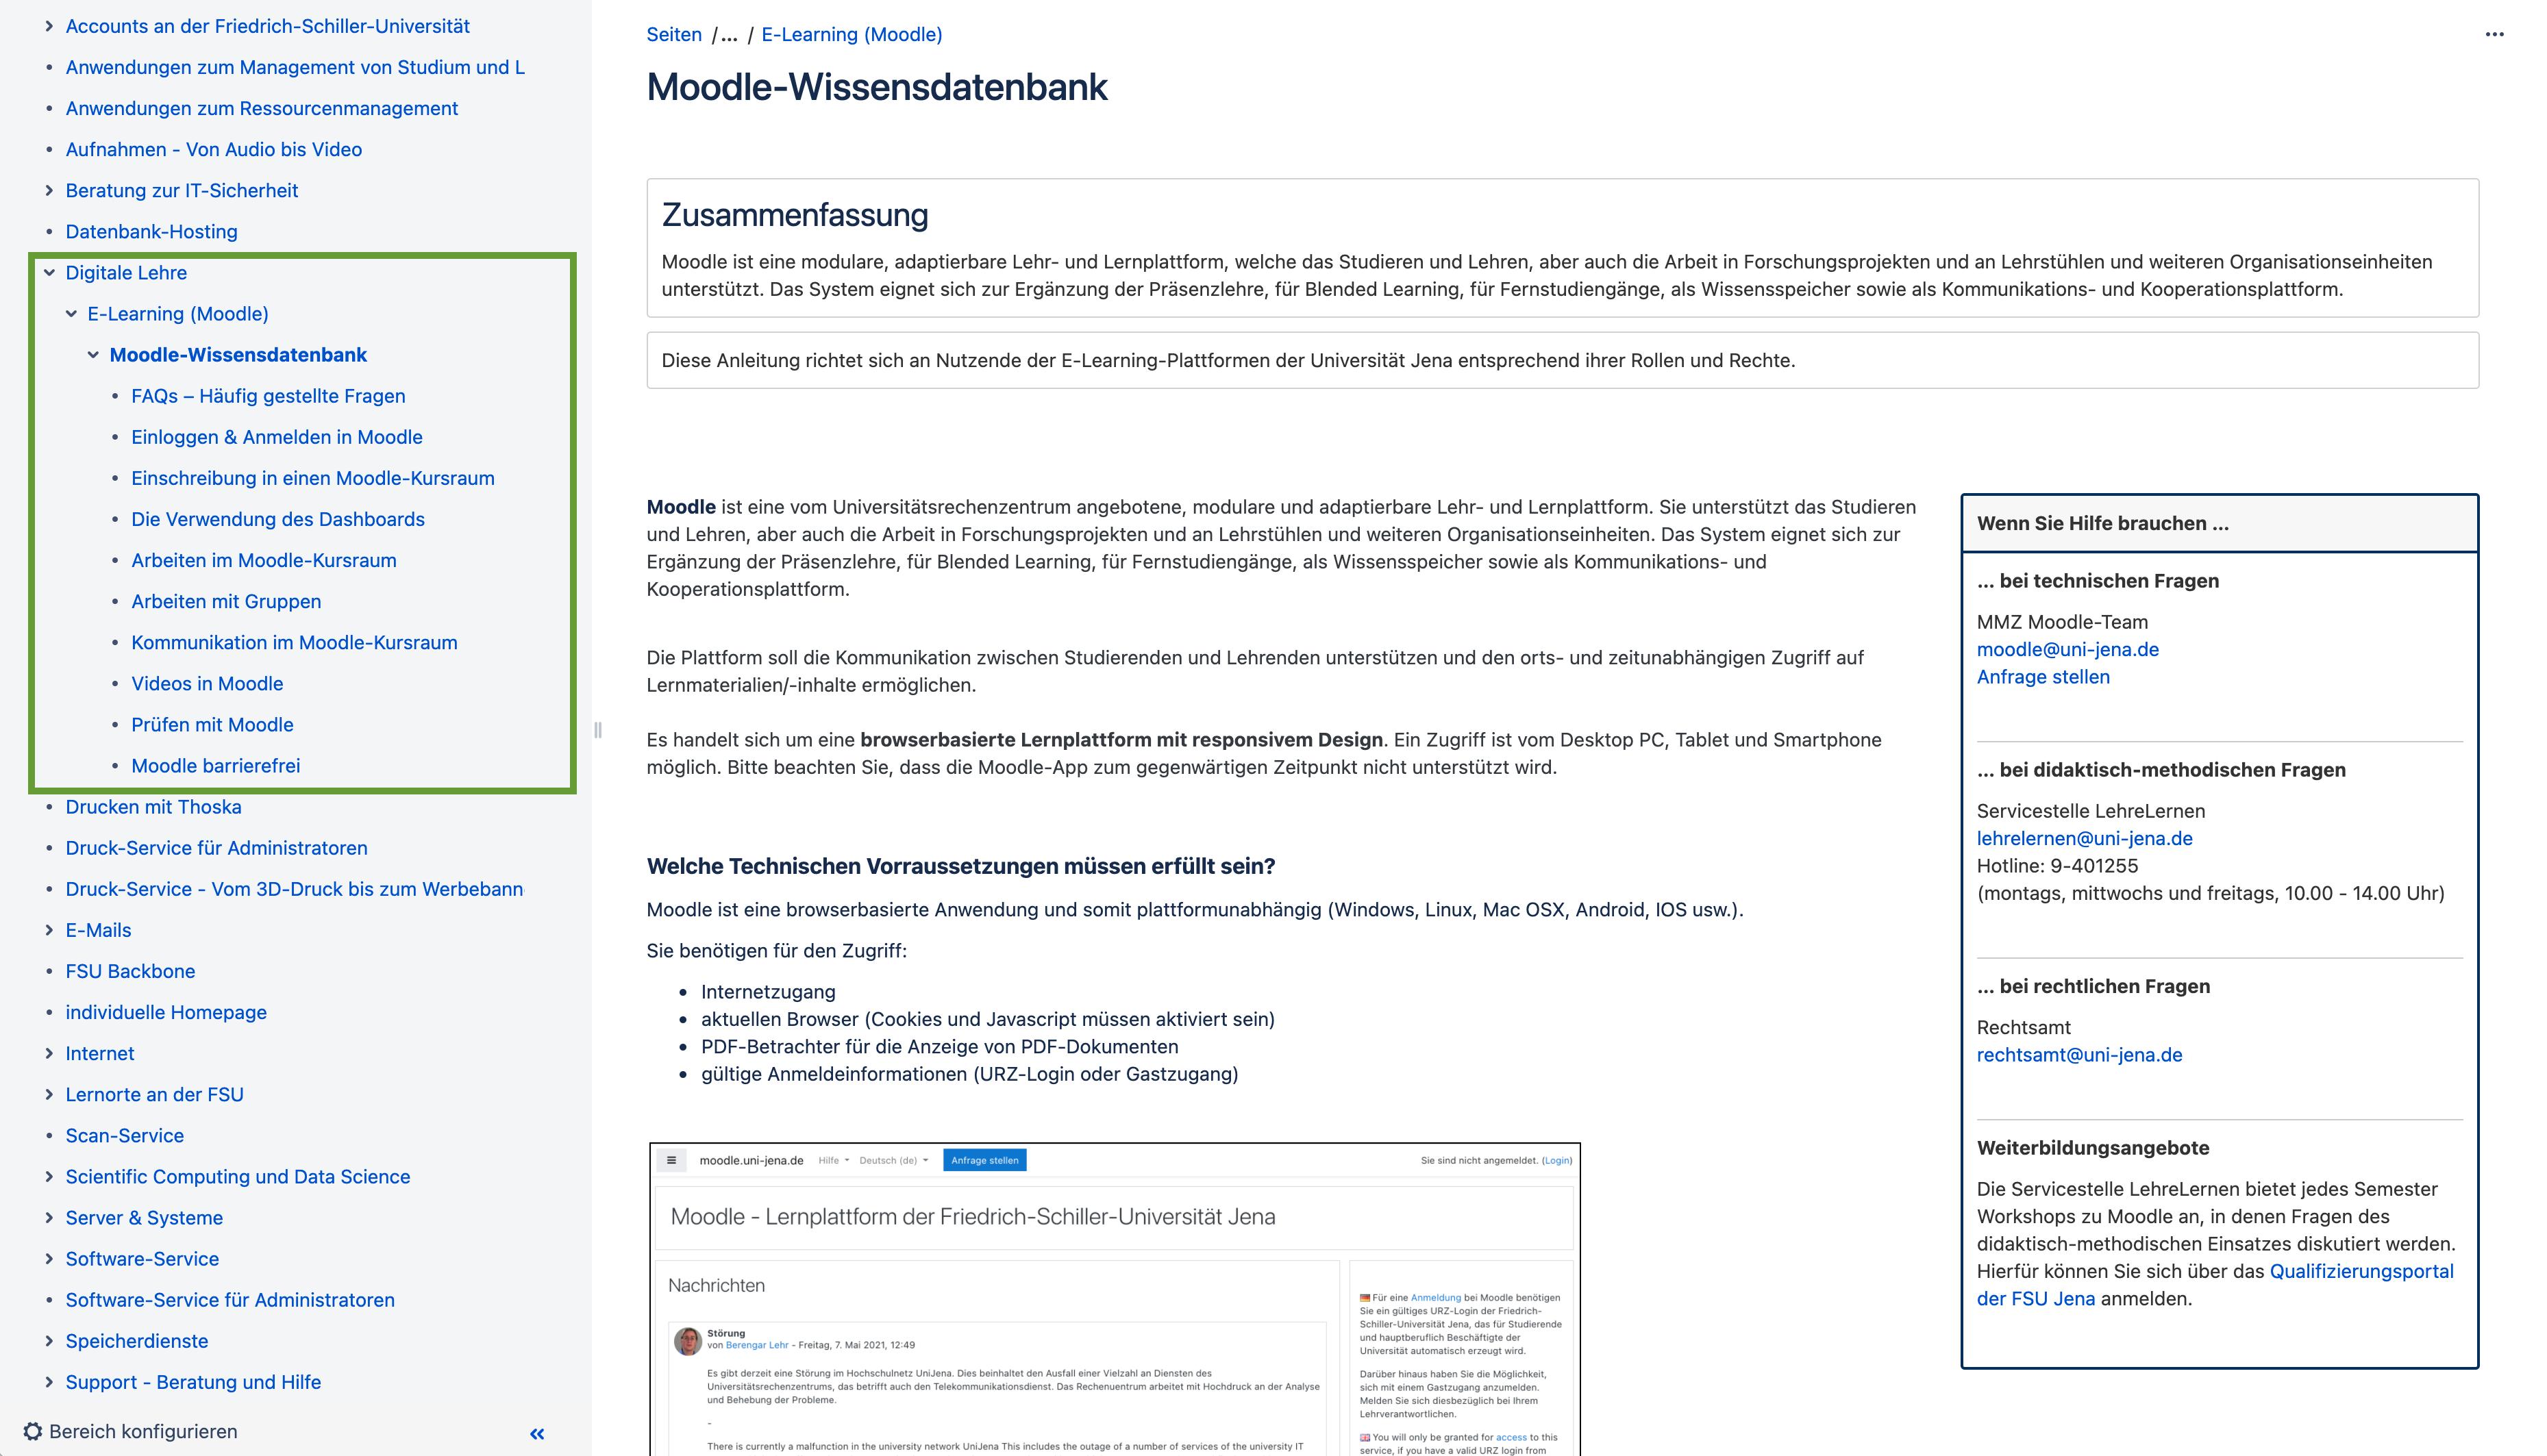 Wiki FSU Jena Moodle-Wissensdatenbank